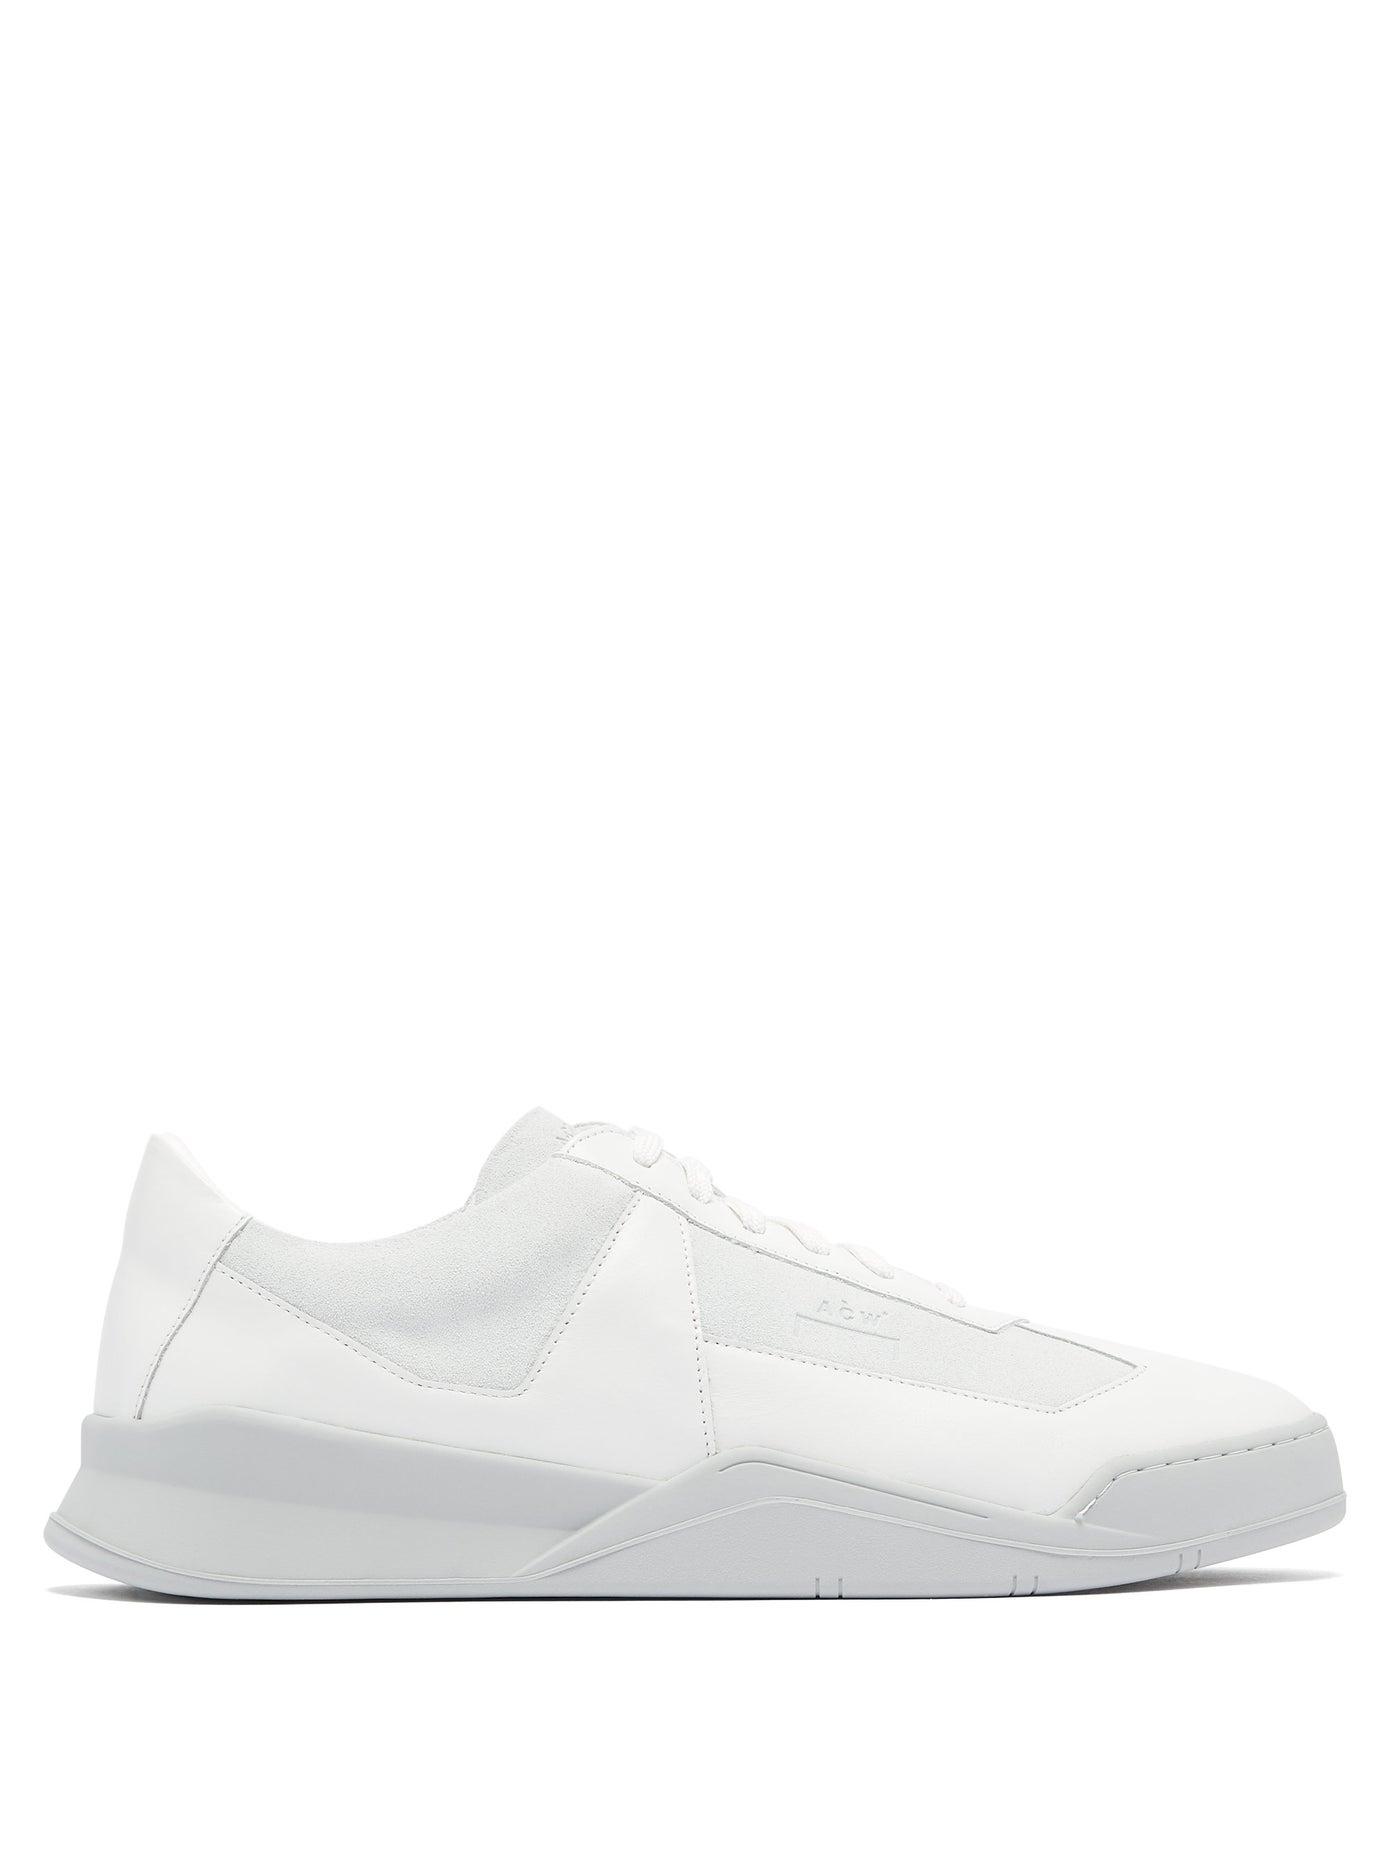 Die besten weißen Sneaker 2020: A-Cold-Wall white sneakers